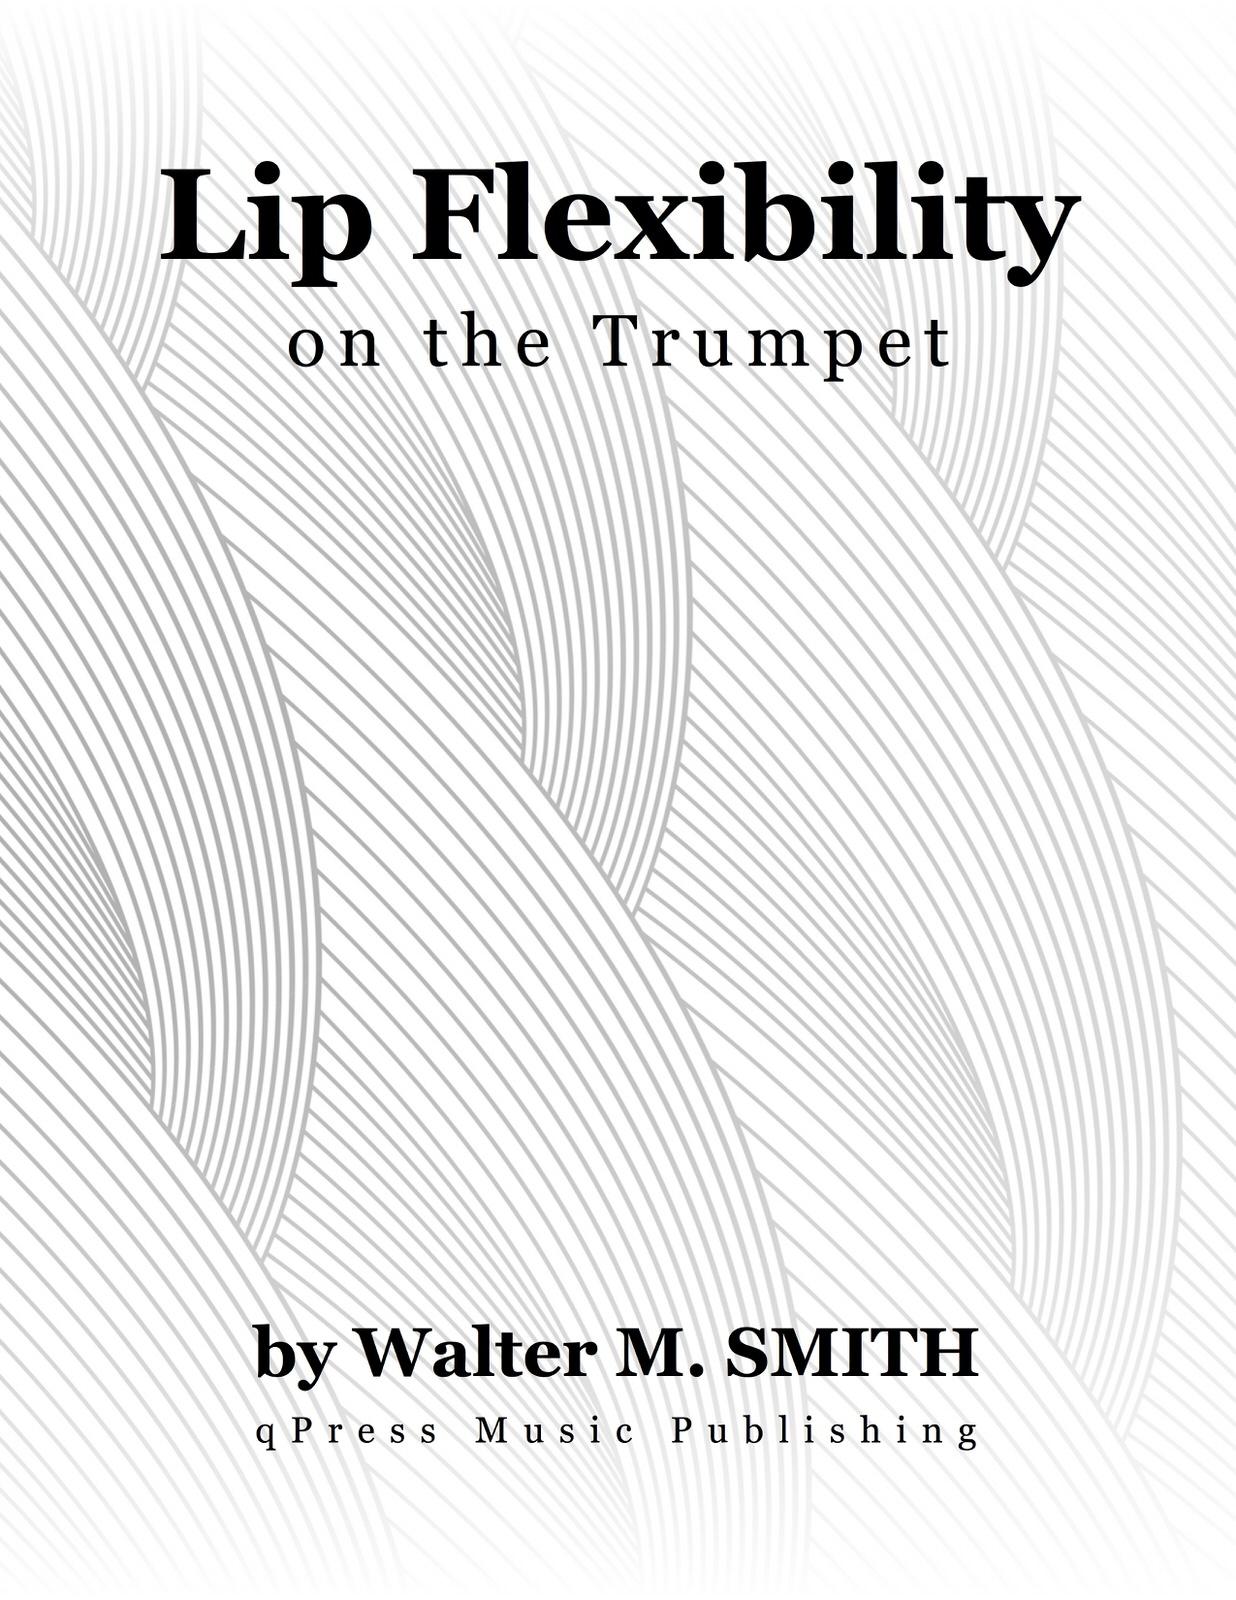 Smith, Walter M, Lip Flexibility for Trumpet-p01